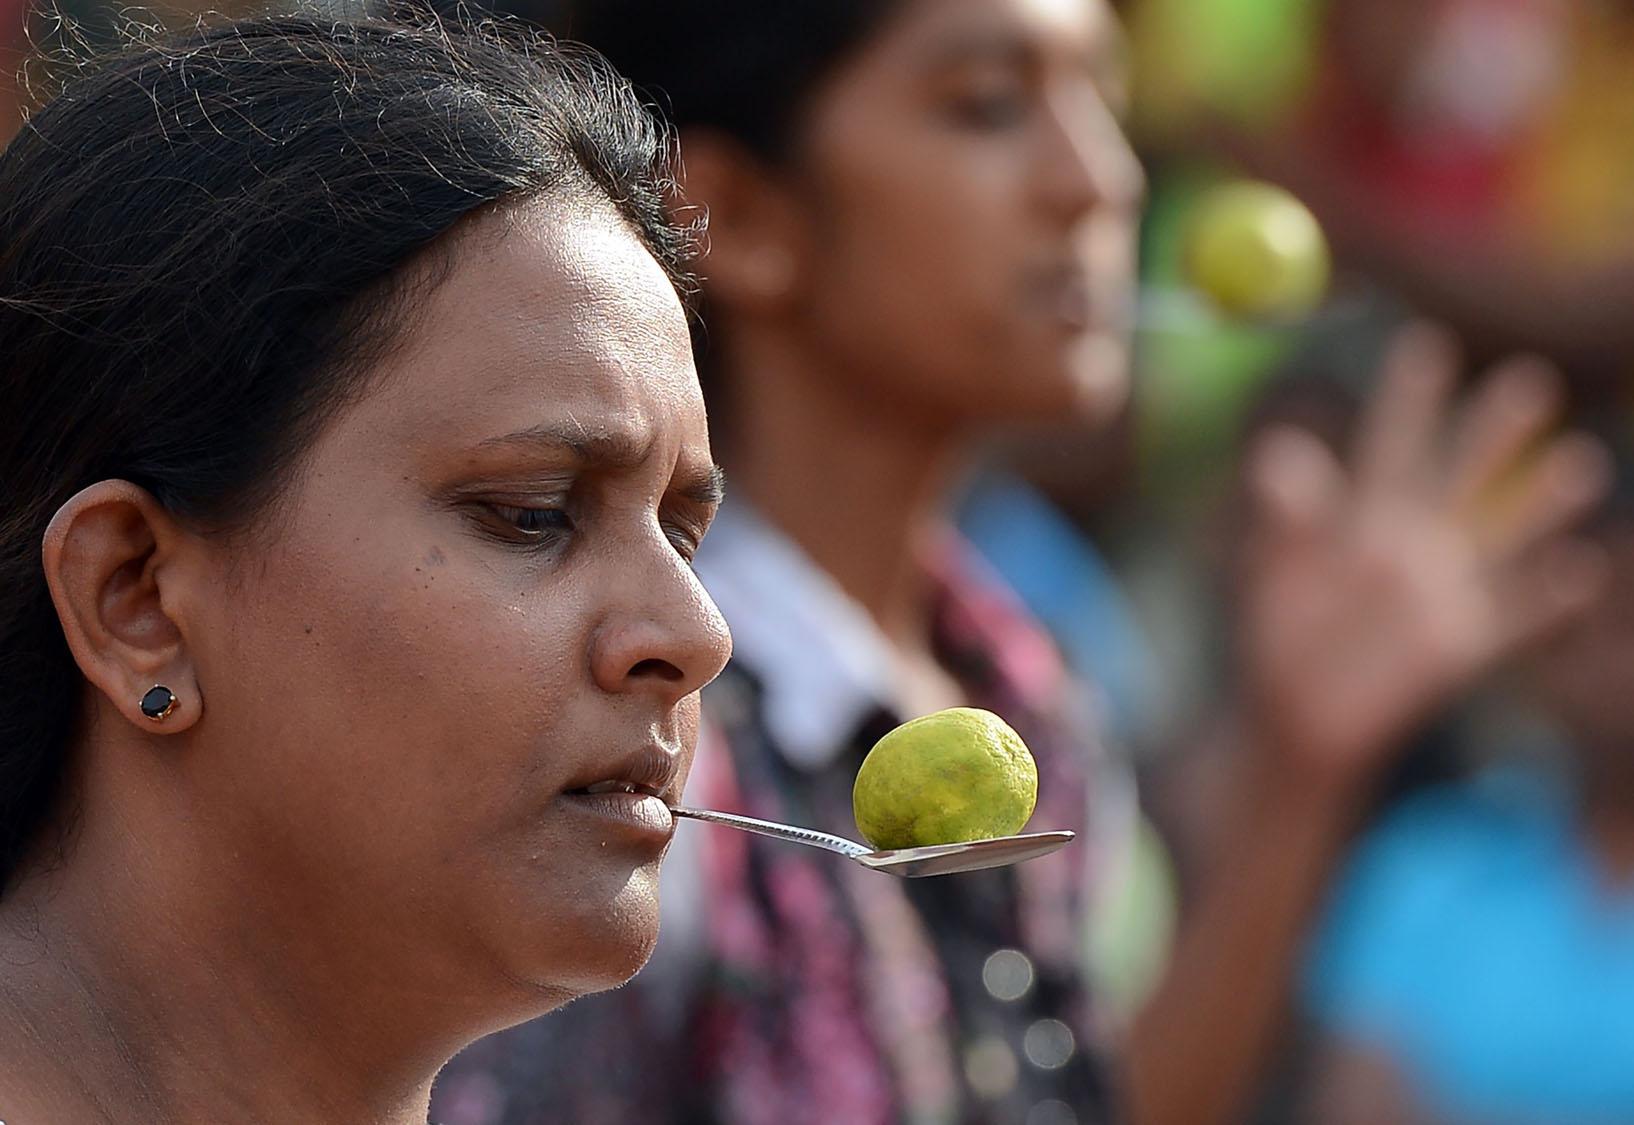 Sri lankan 19 years old boy vs married woman